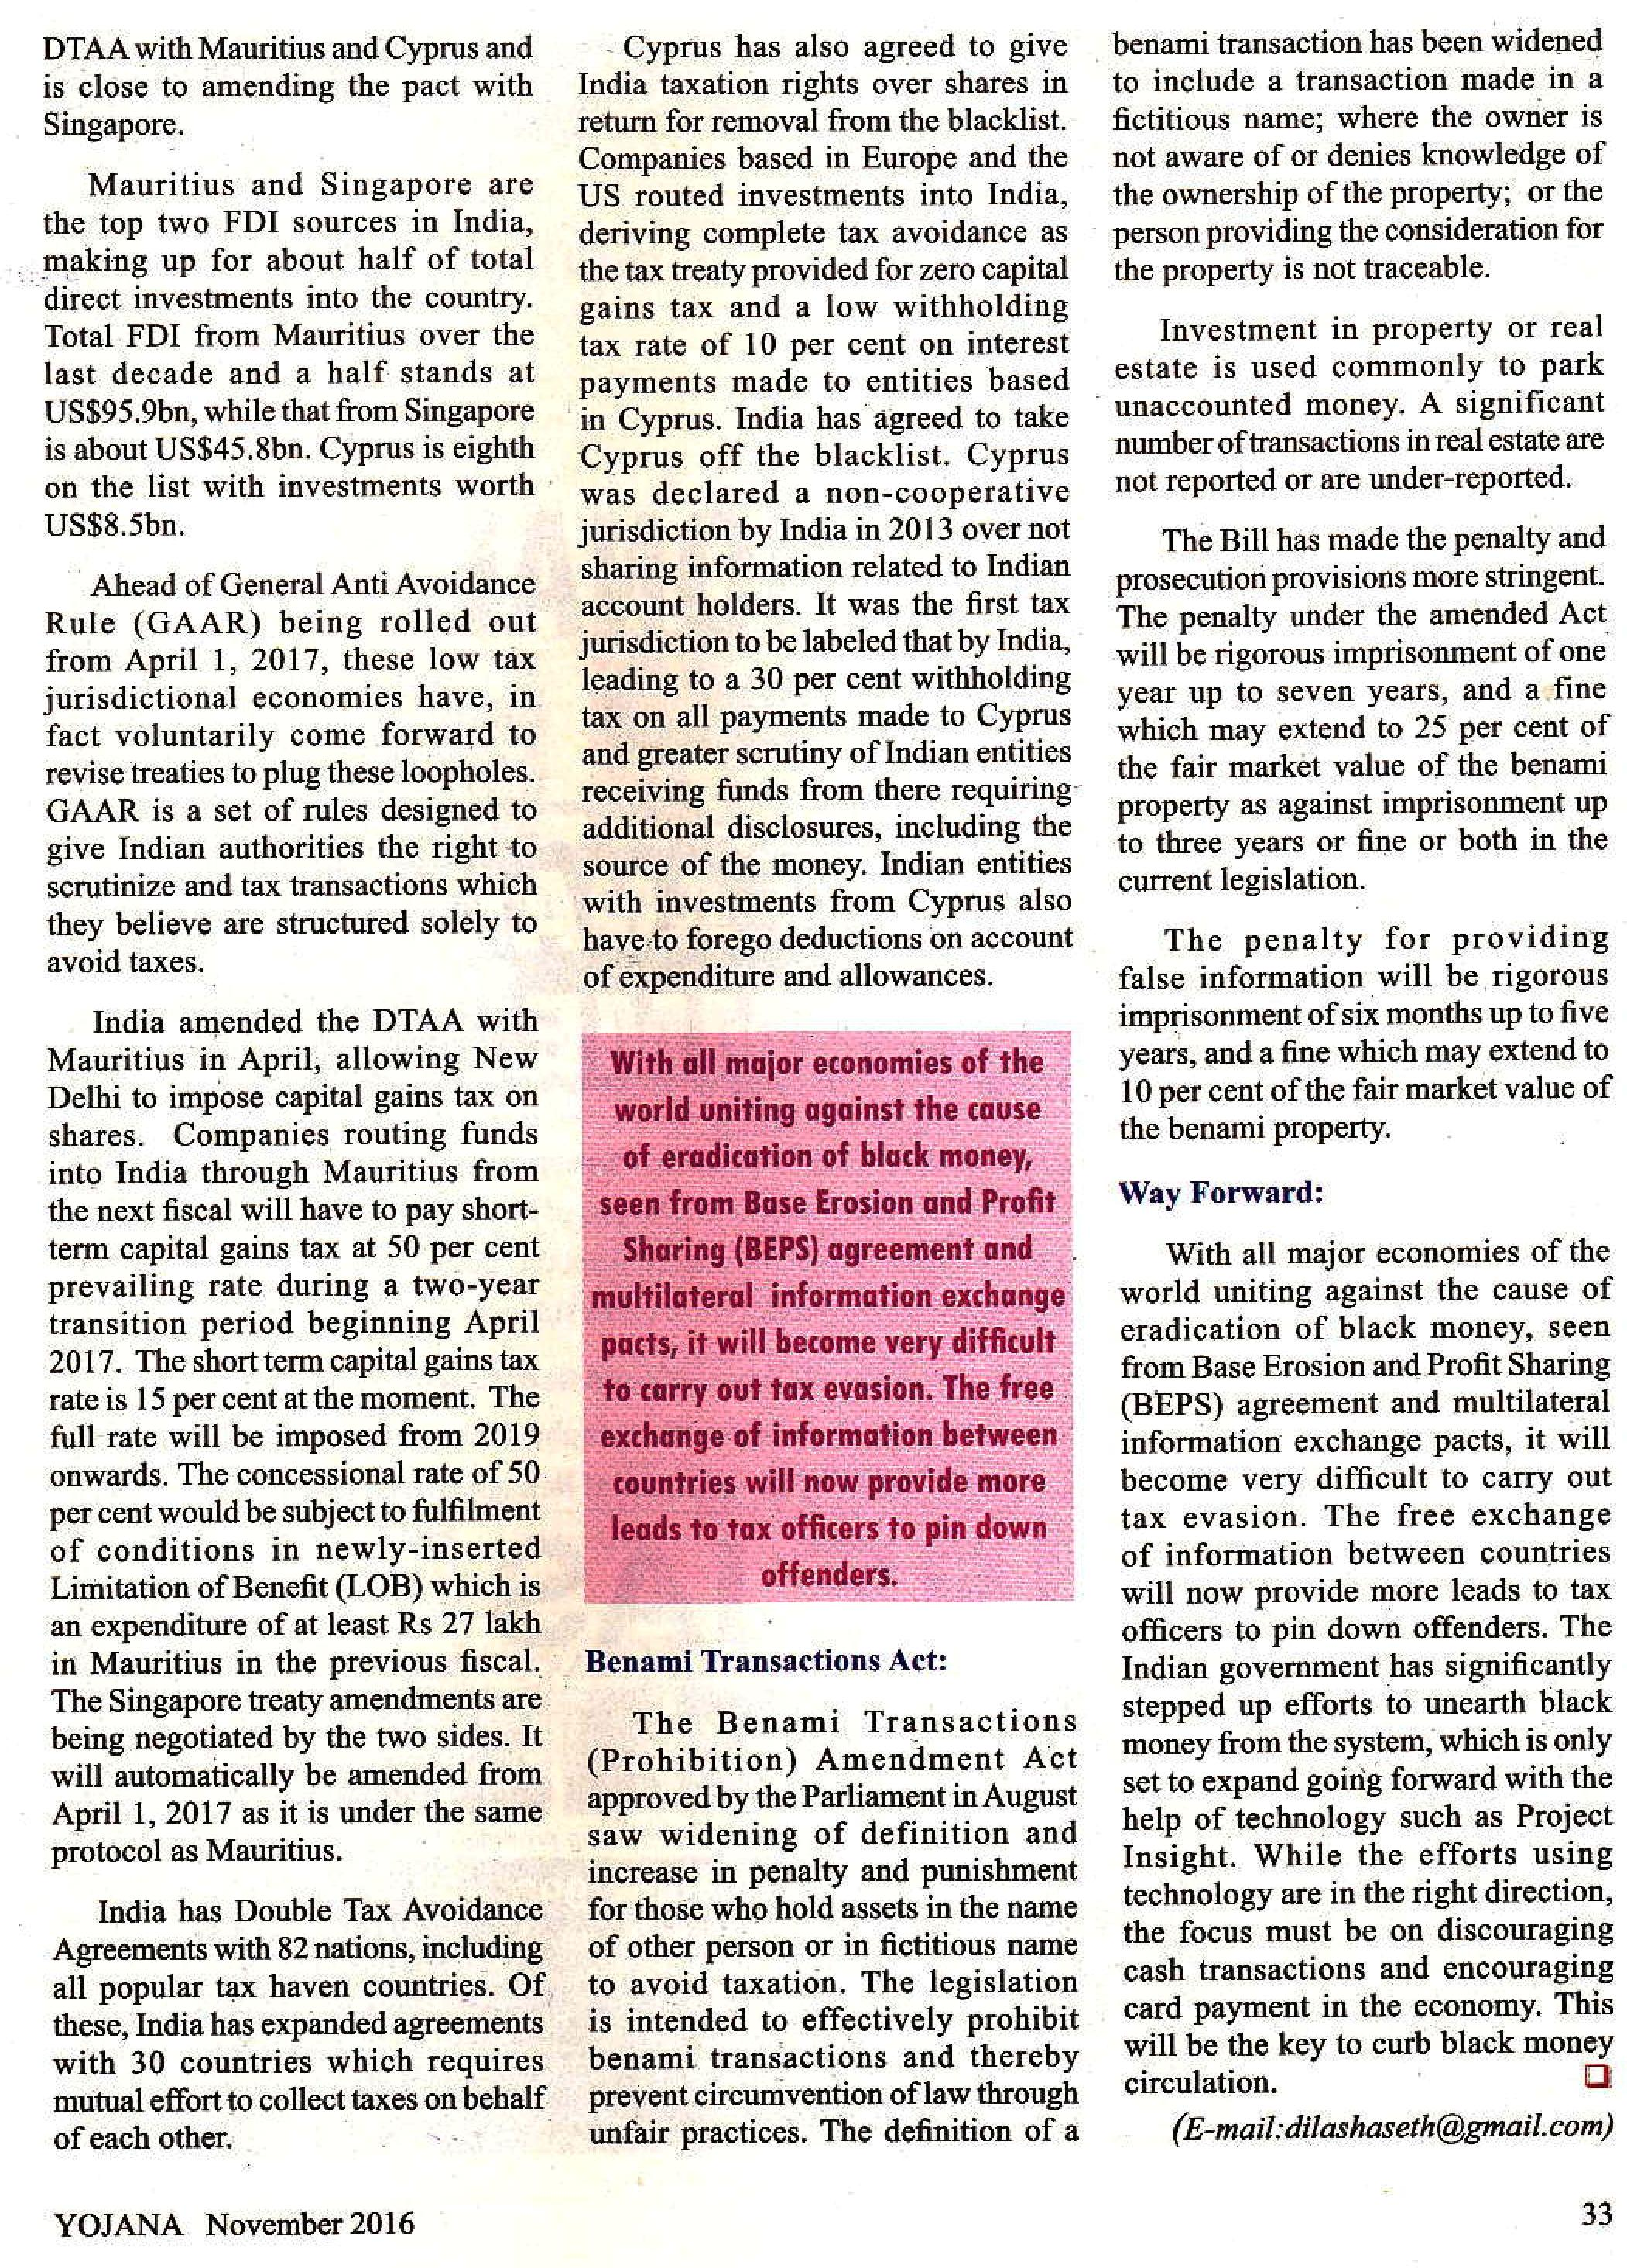 Yojana: Black Money Menace-Government On war-Footing (19-11